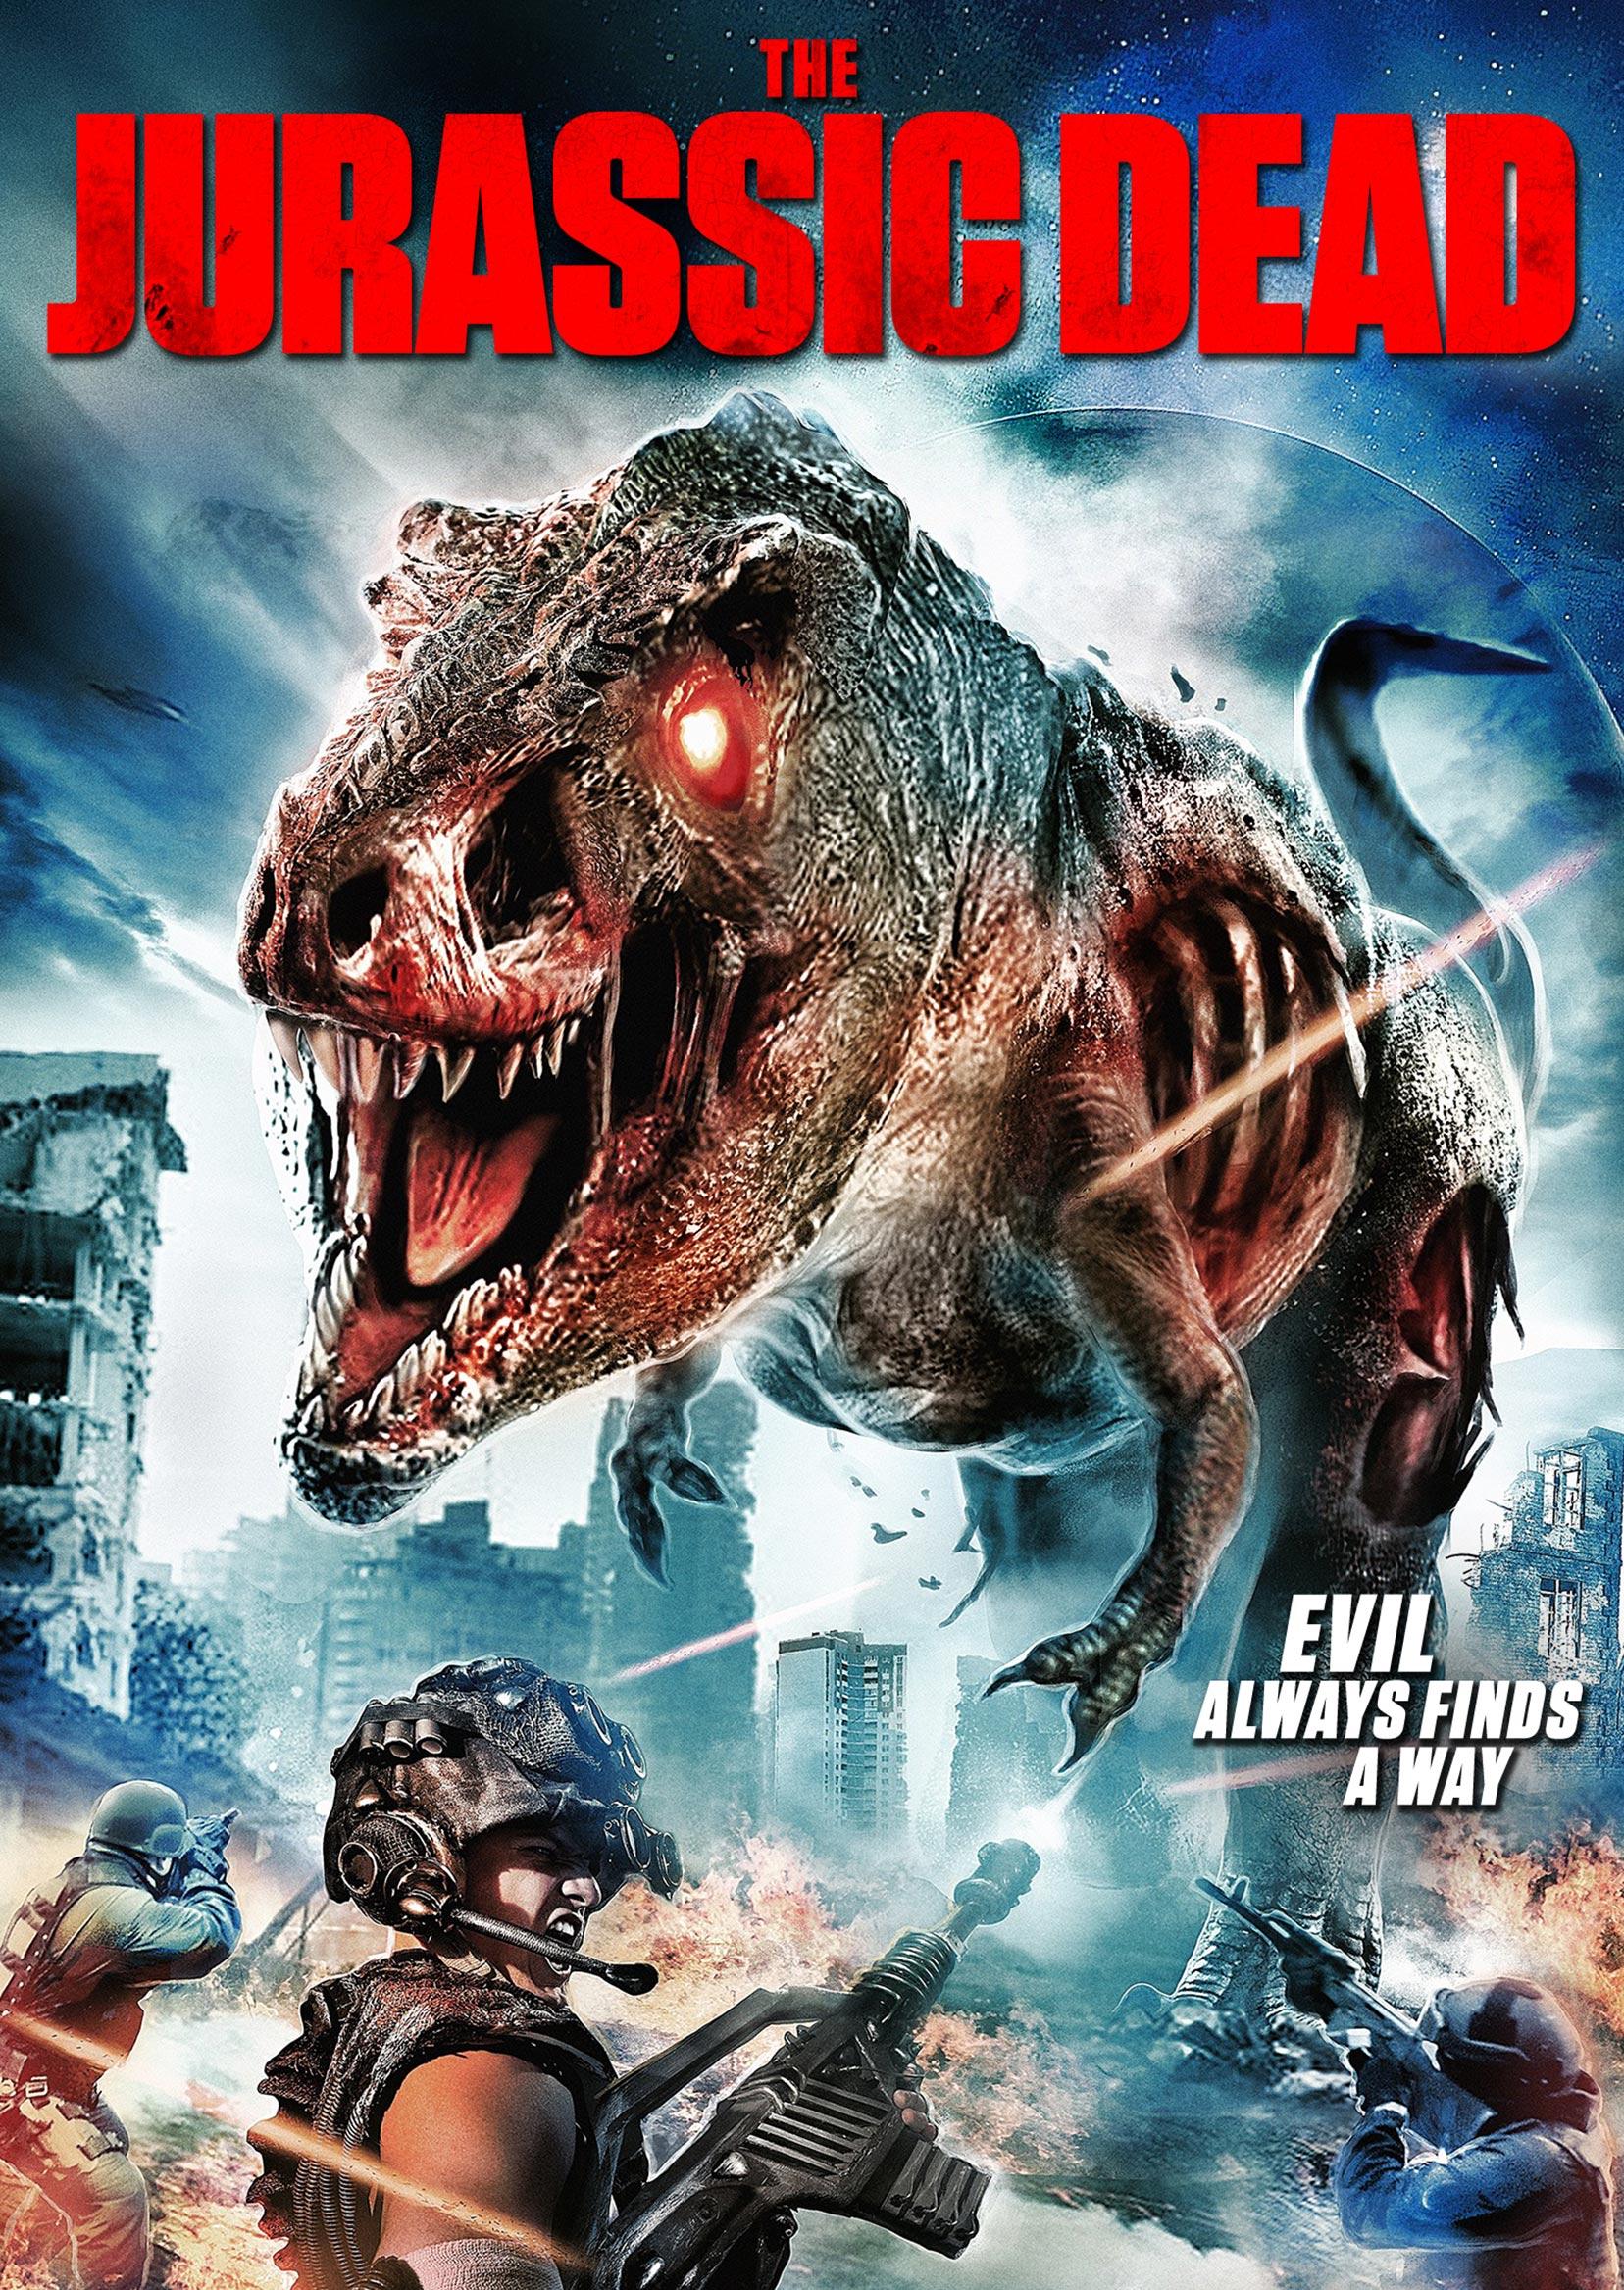 The Jurassic Dead Poster #1